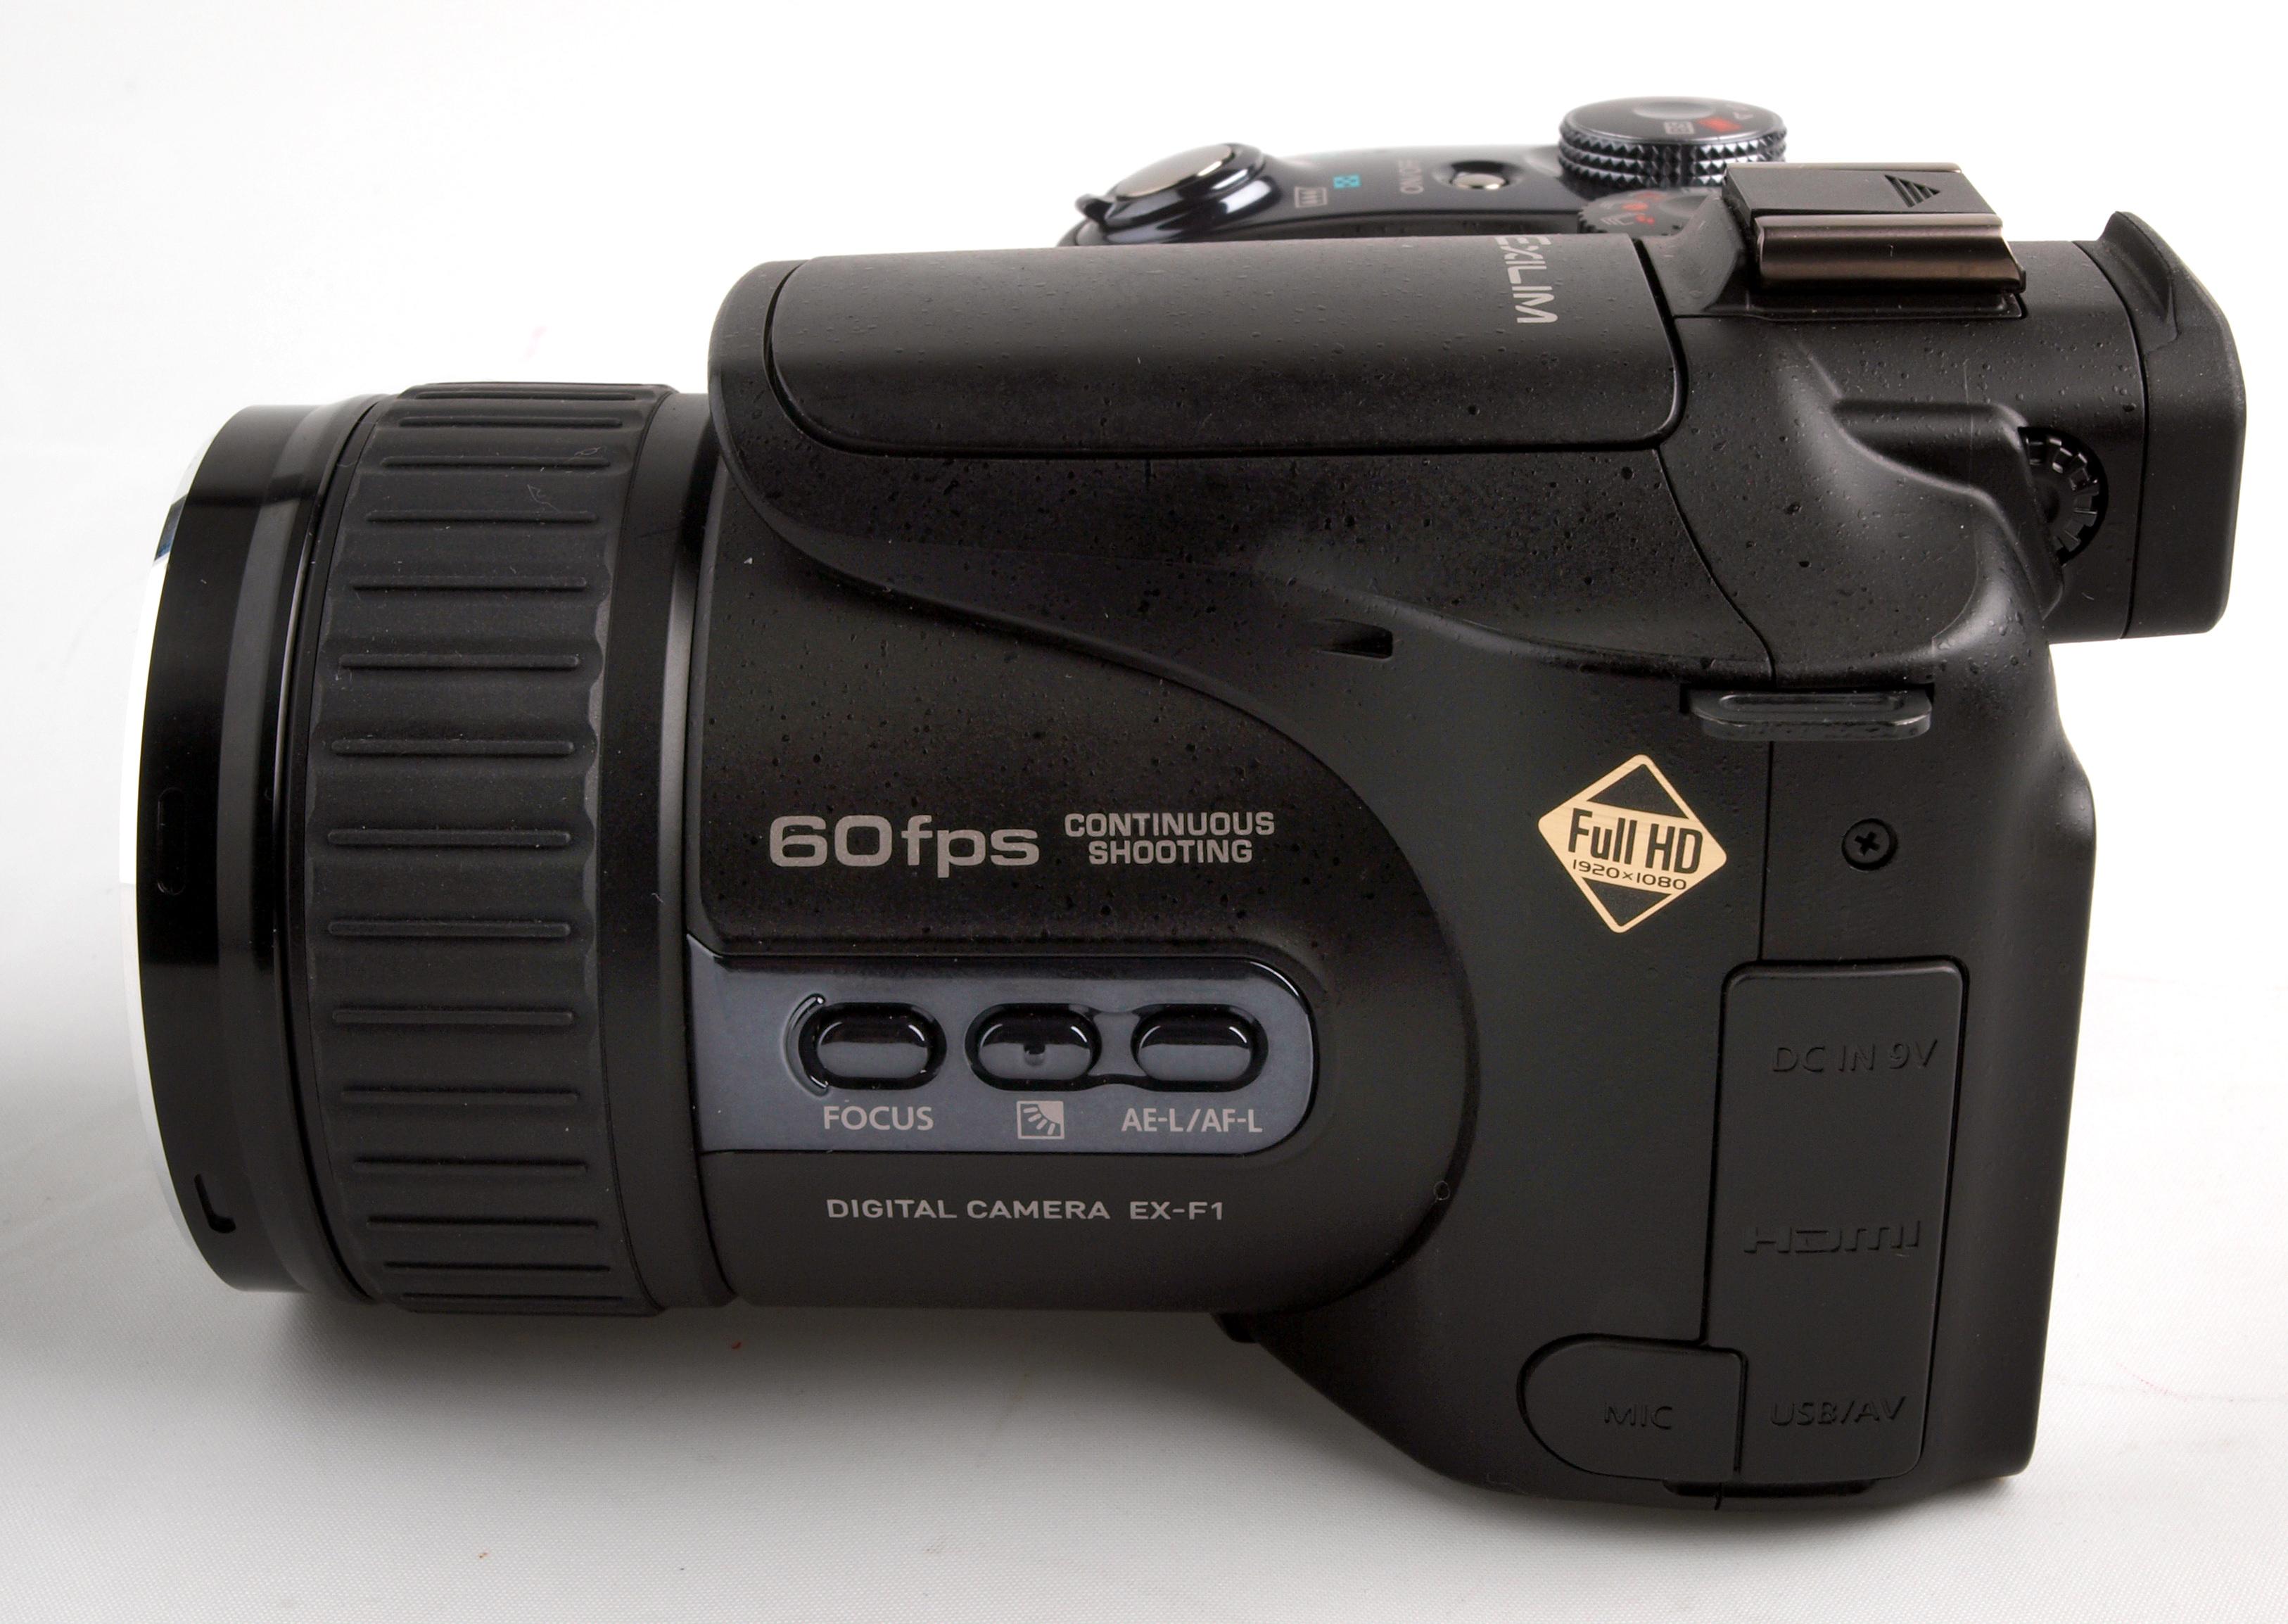 casio ex f1 digital camera review rh ephotozine com Casio Exilim User Manual Verizon Casio Exilim Manual